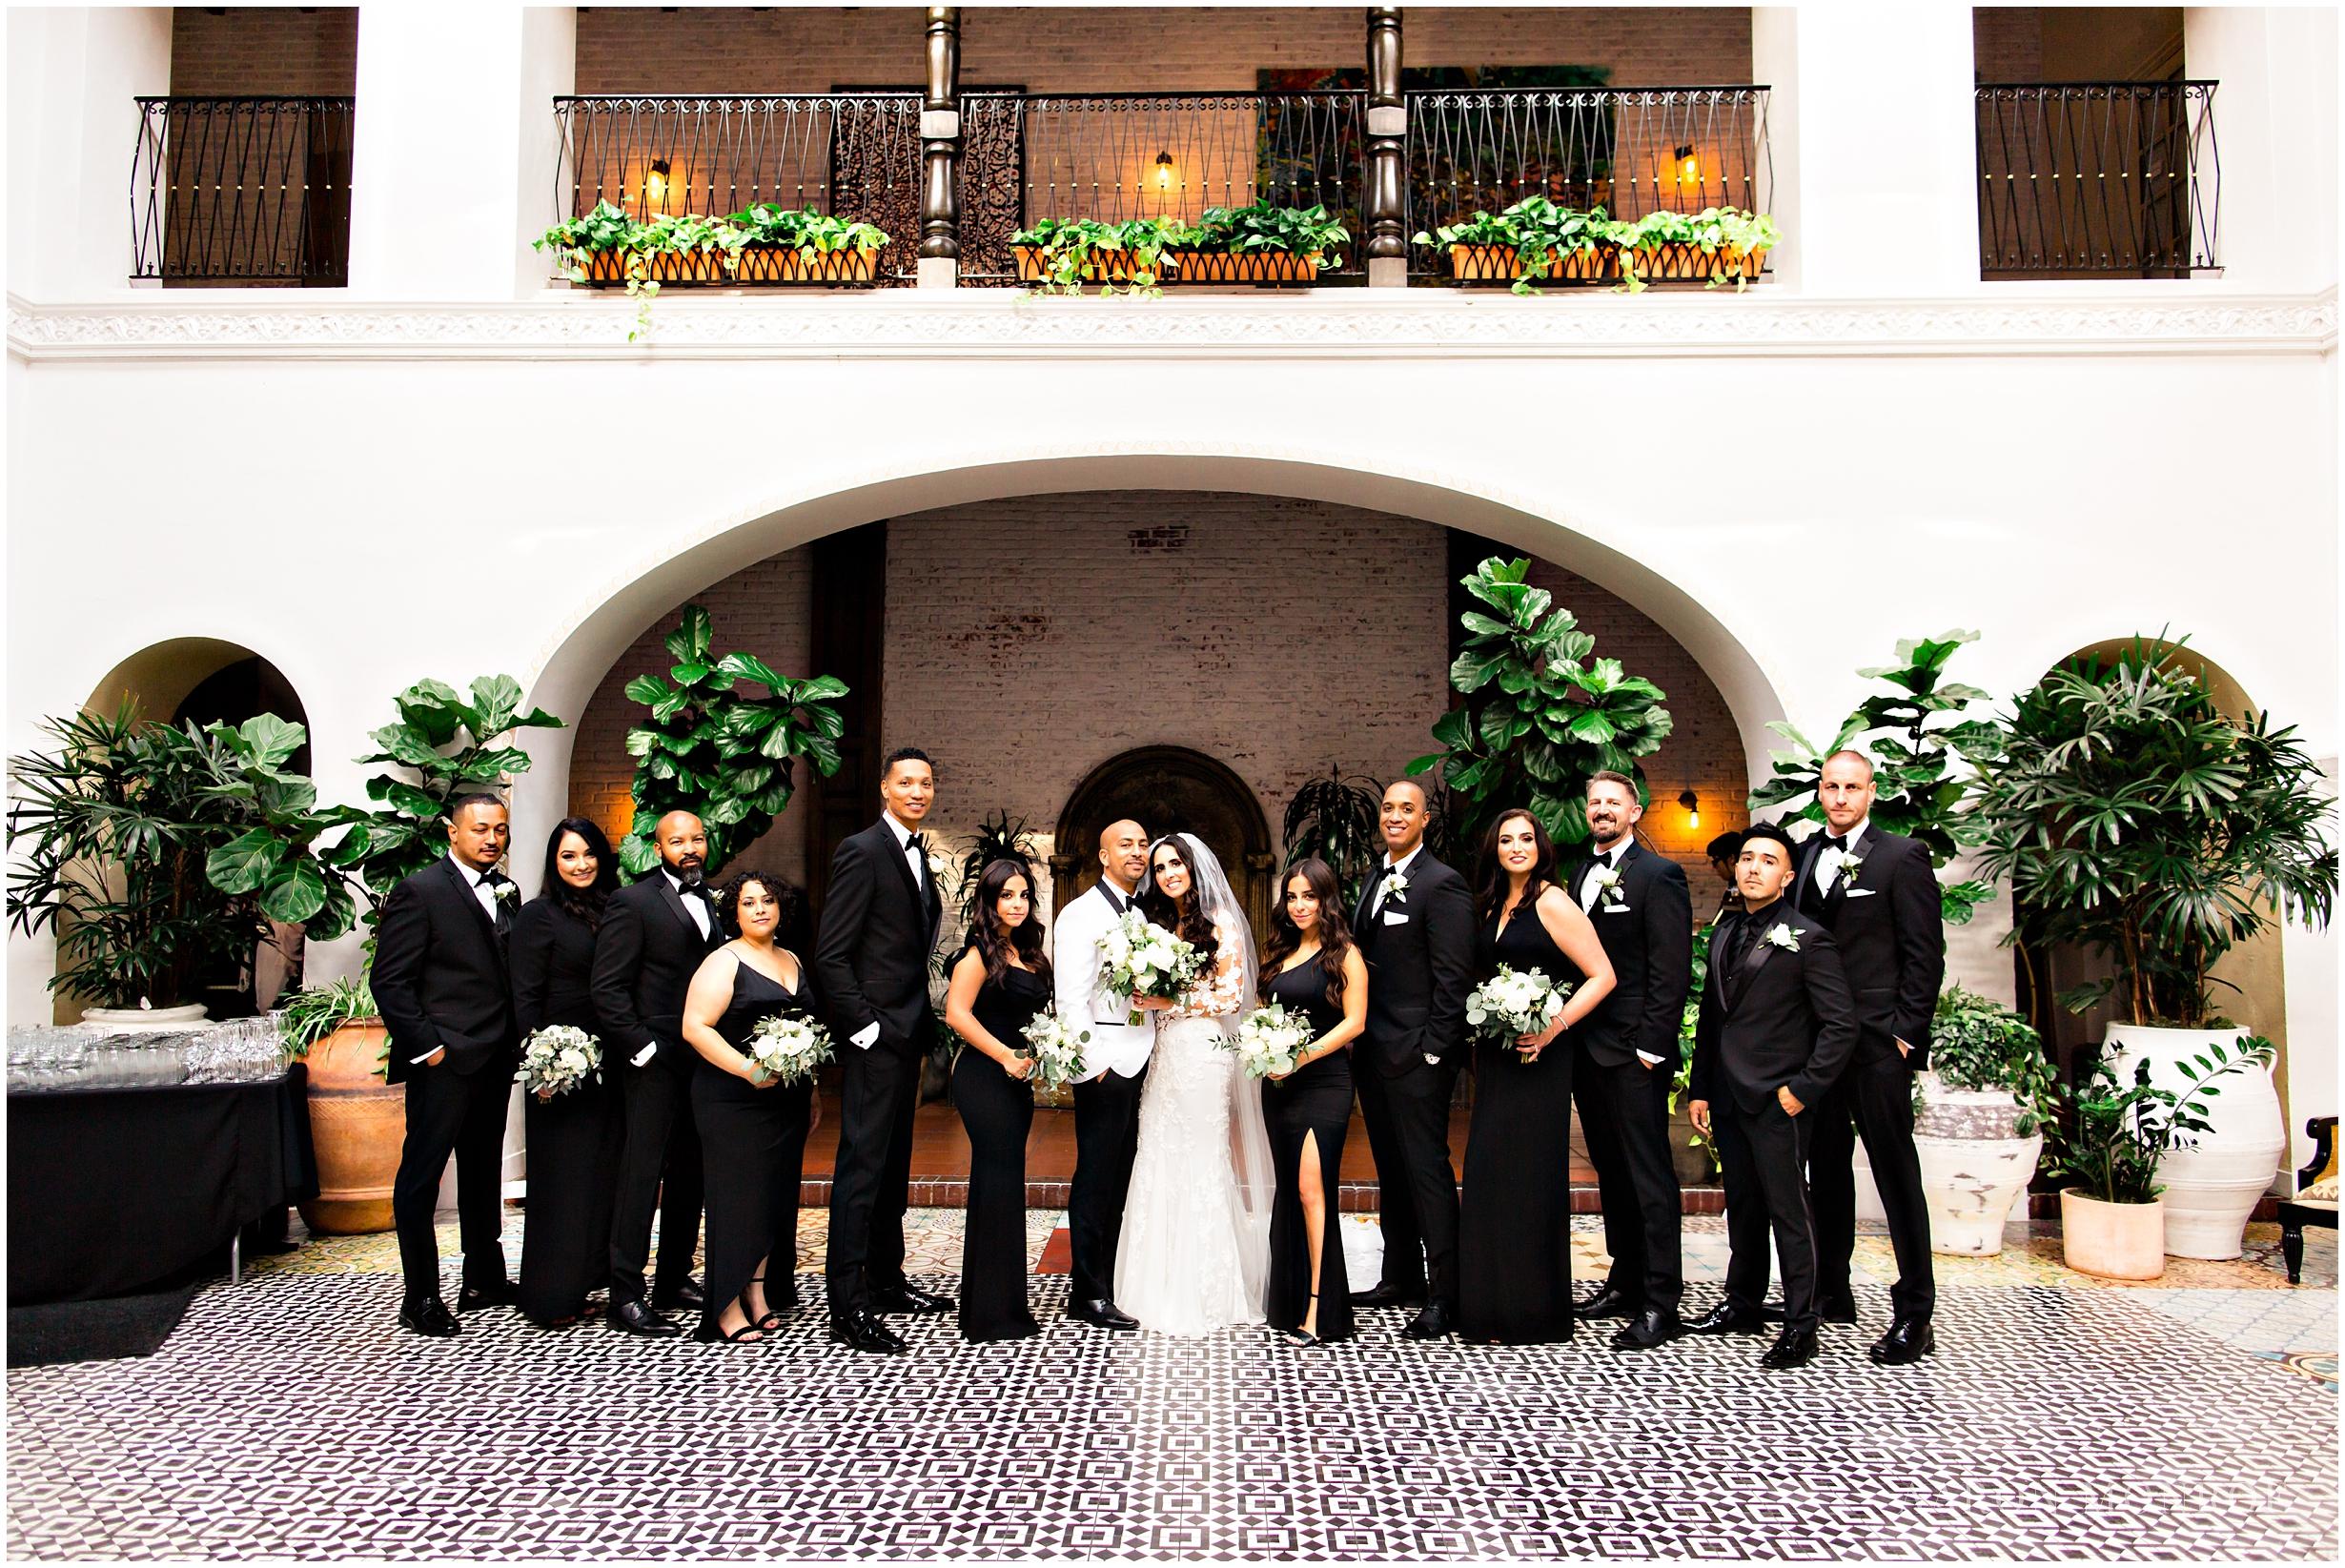 Ebell_Long_Beach_Wedding_Photography_0847.jpg